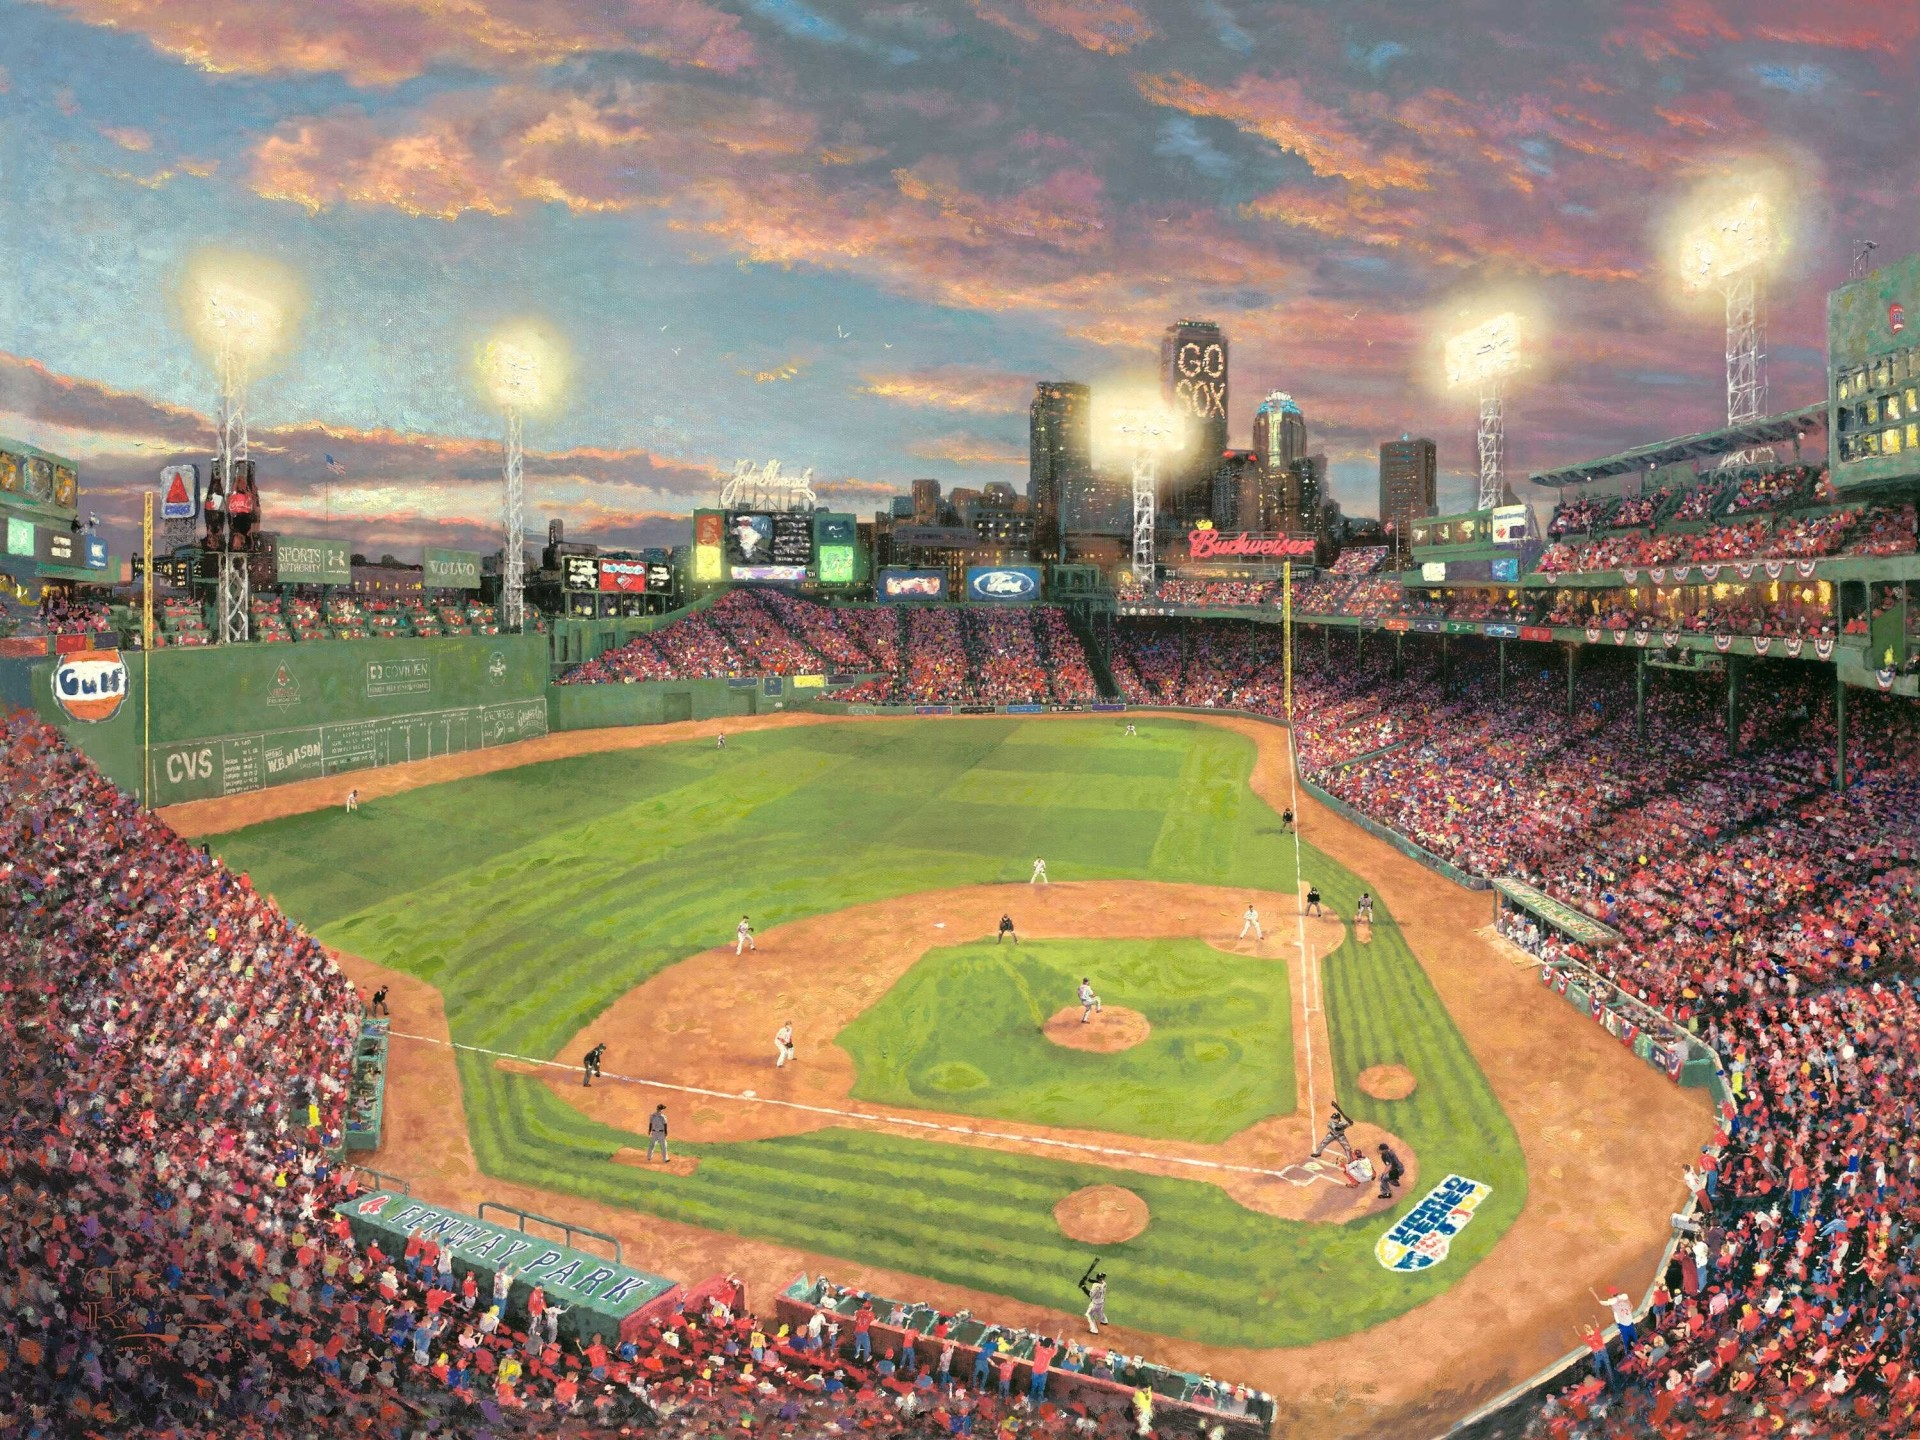 1920x1440 Baseball Stadium Fenway Park Wallpapers